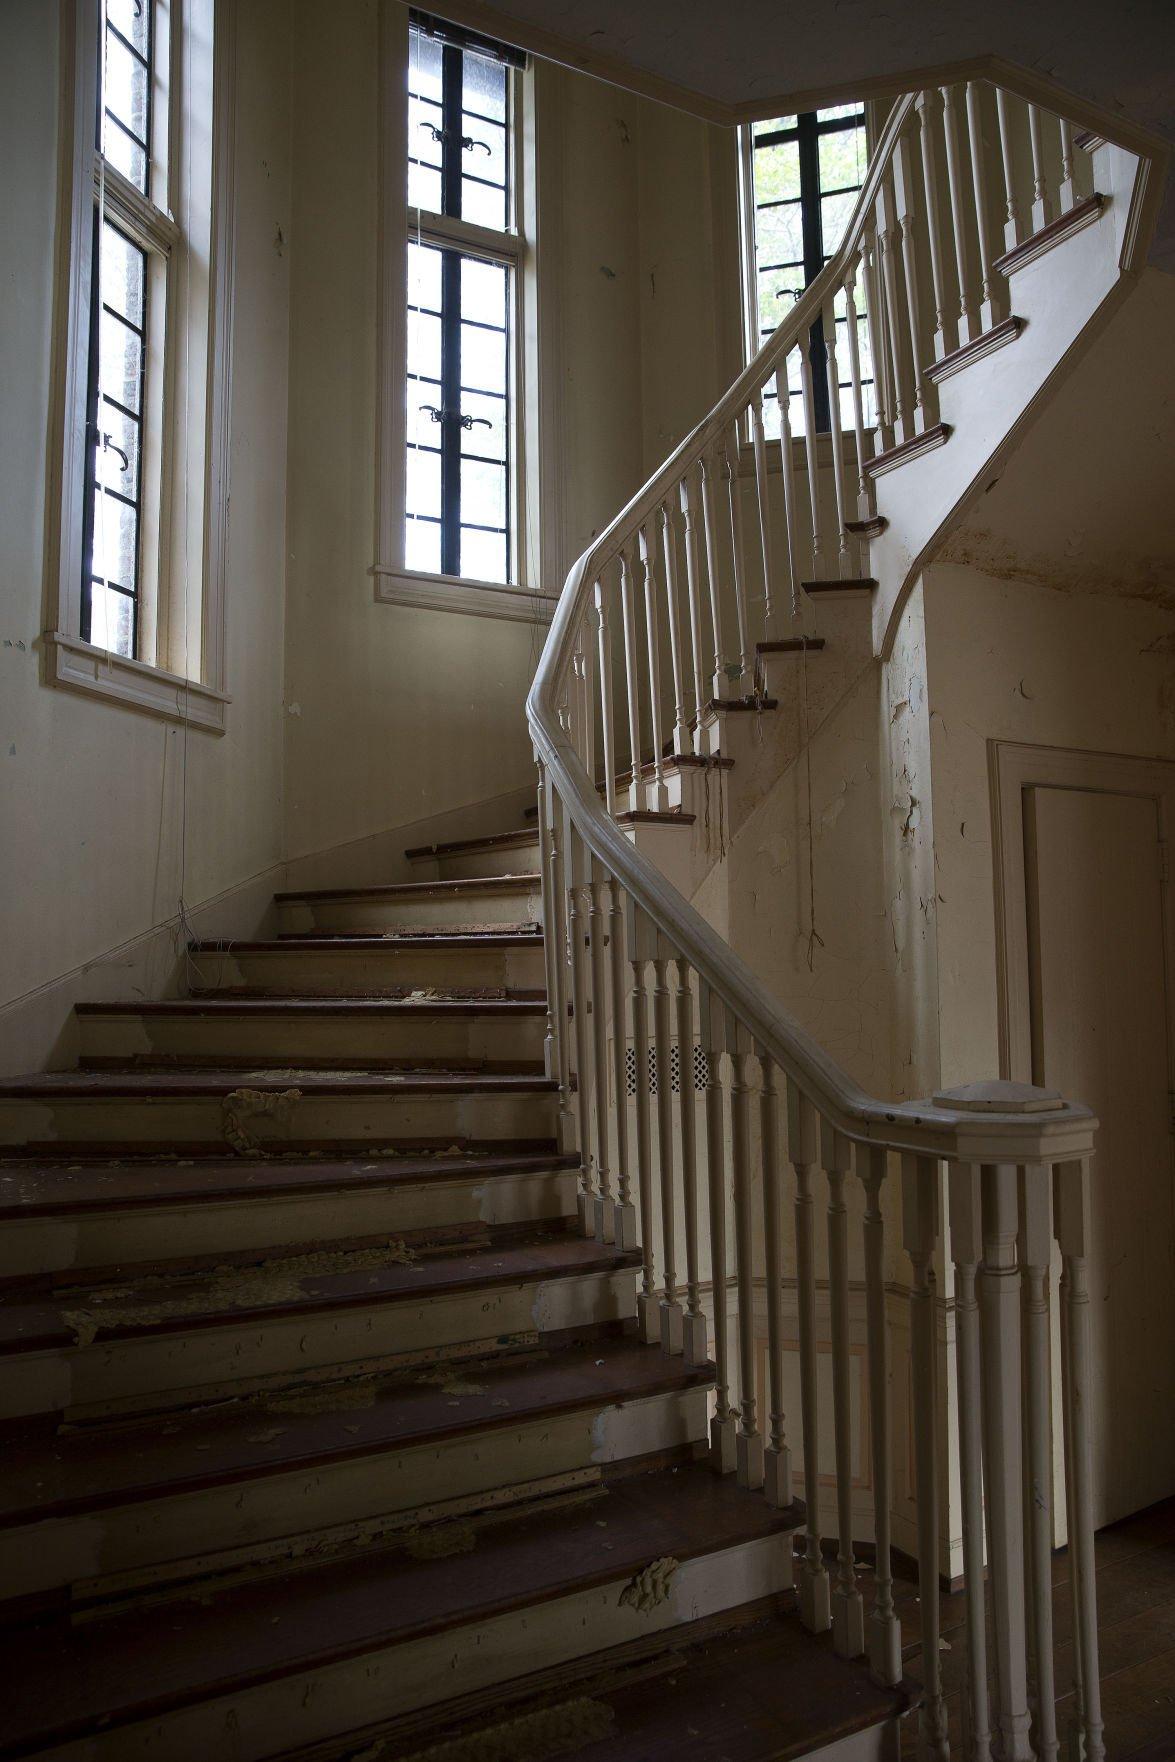 Peek inside Greensboro's historic Julian Price house